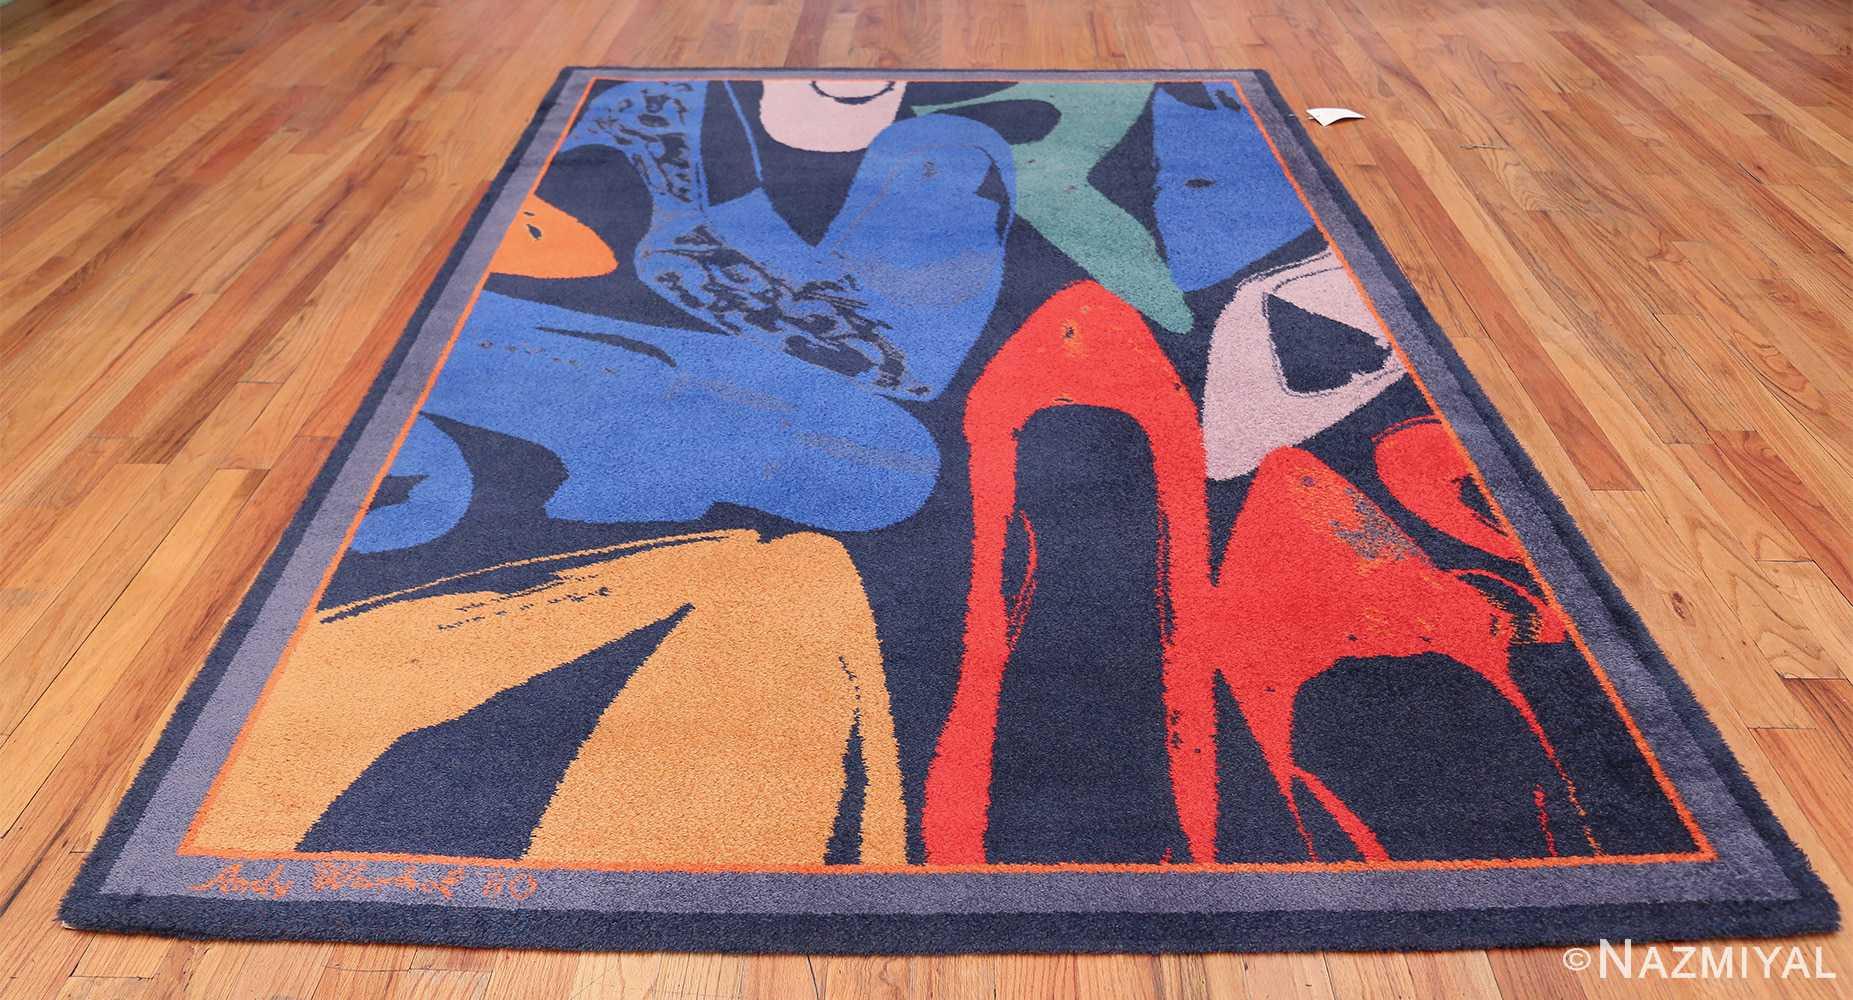 Vintage Andy Warhol Ege Art Line Diamond Dust Shoes Scandinavian rug 49784 whole Nazmiyal